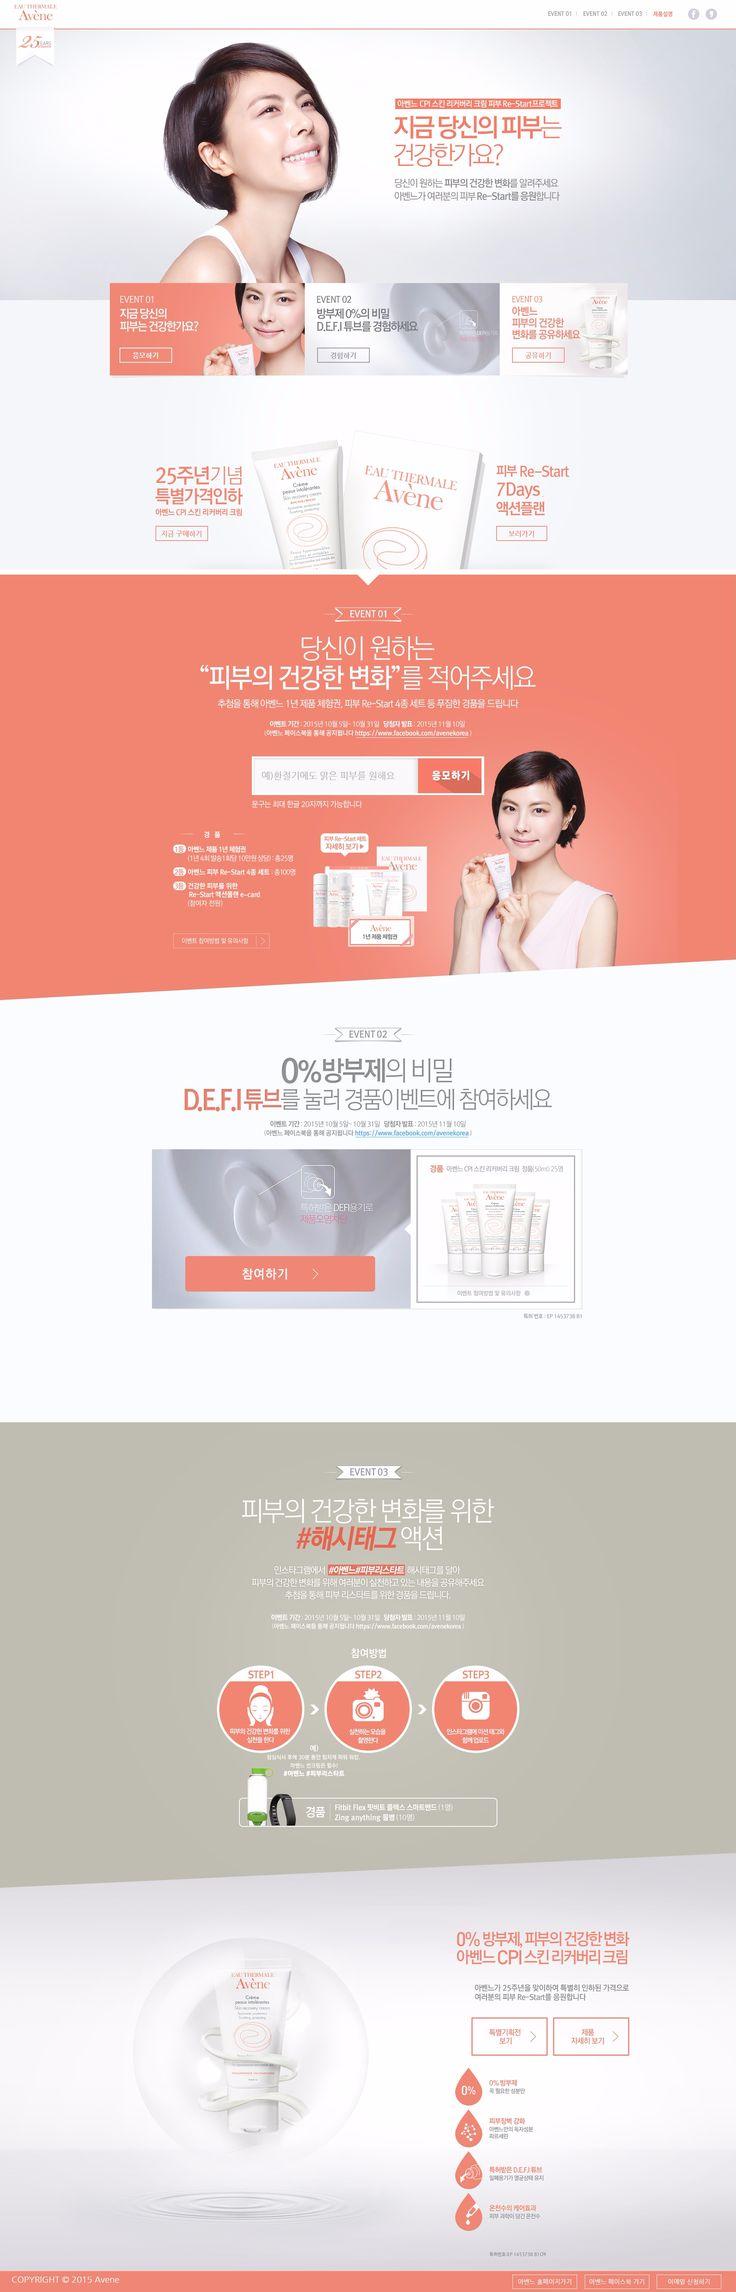 Korean web design. #peach #gray